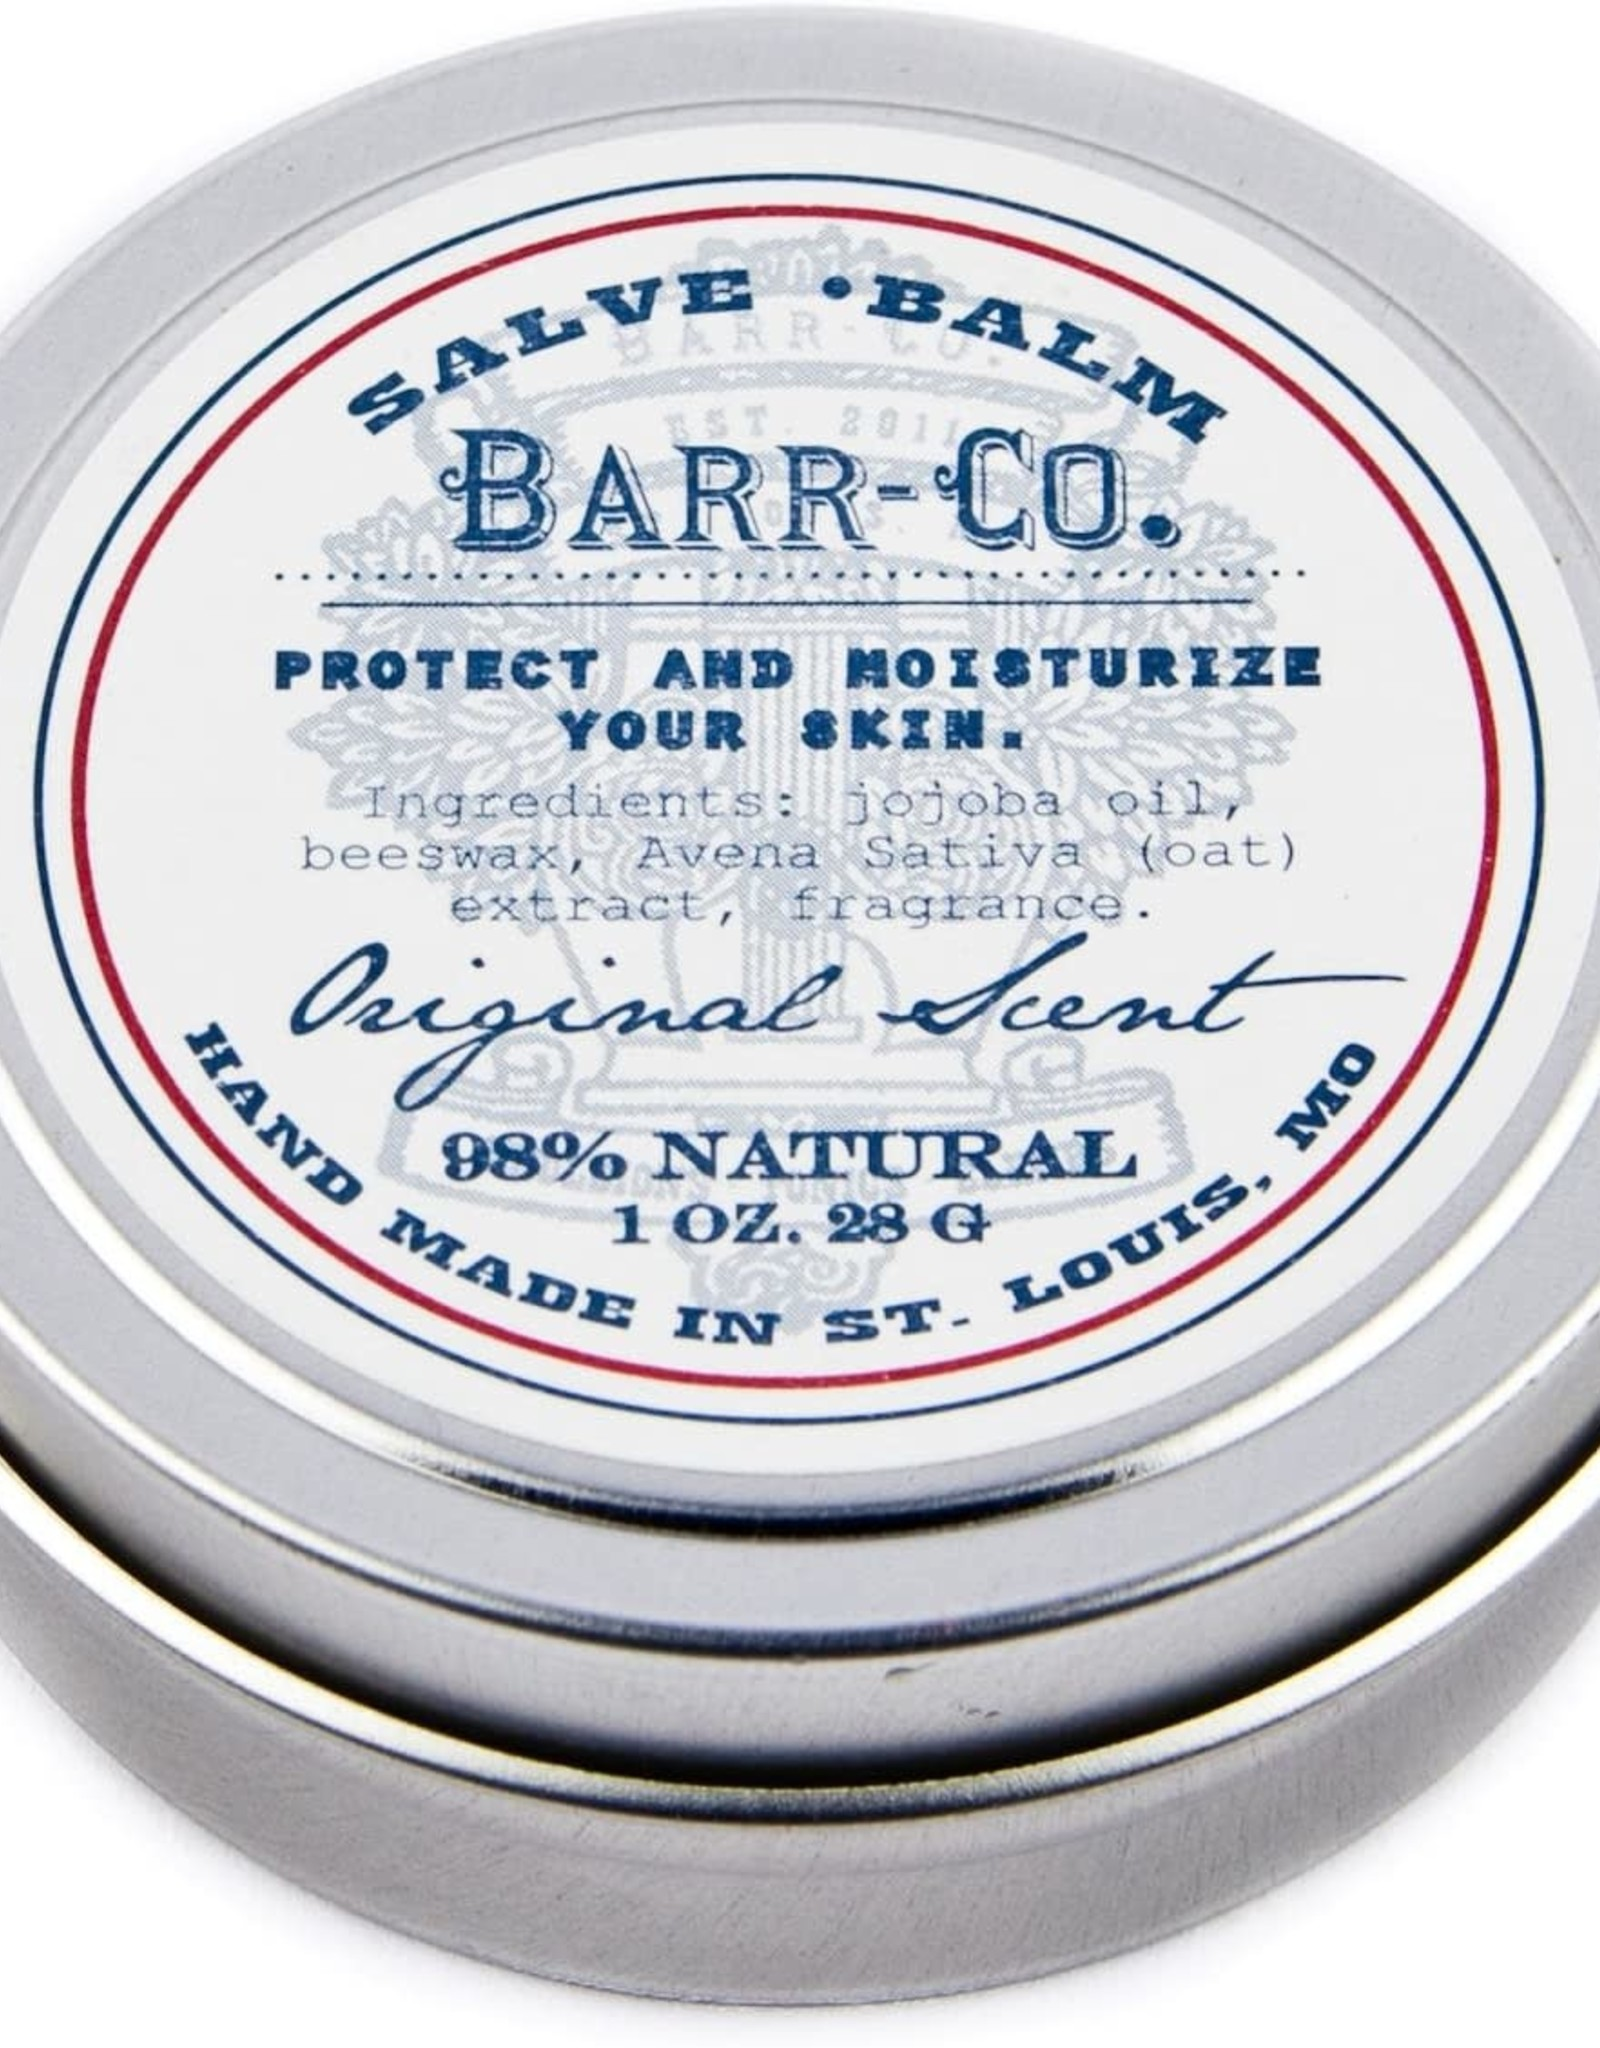 Hand Salve - Original Scent